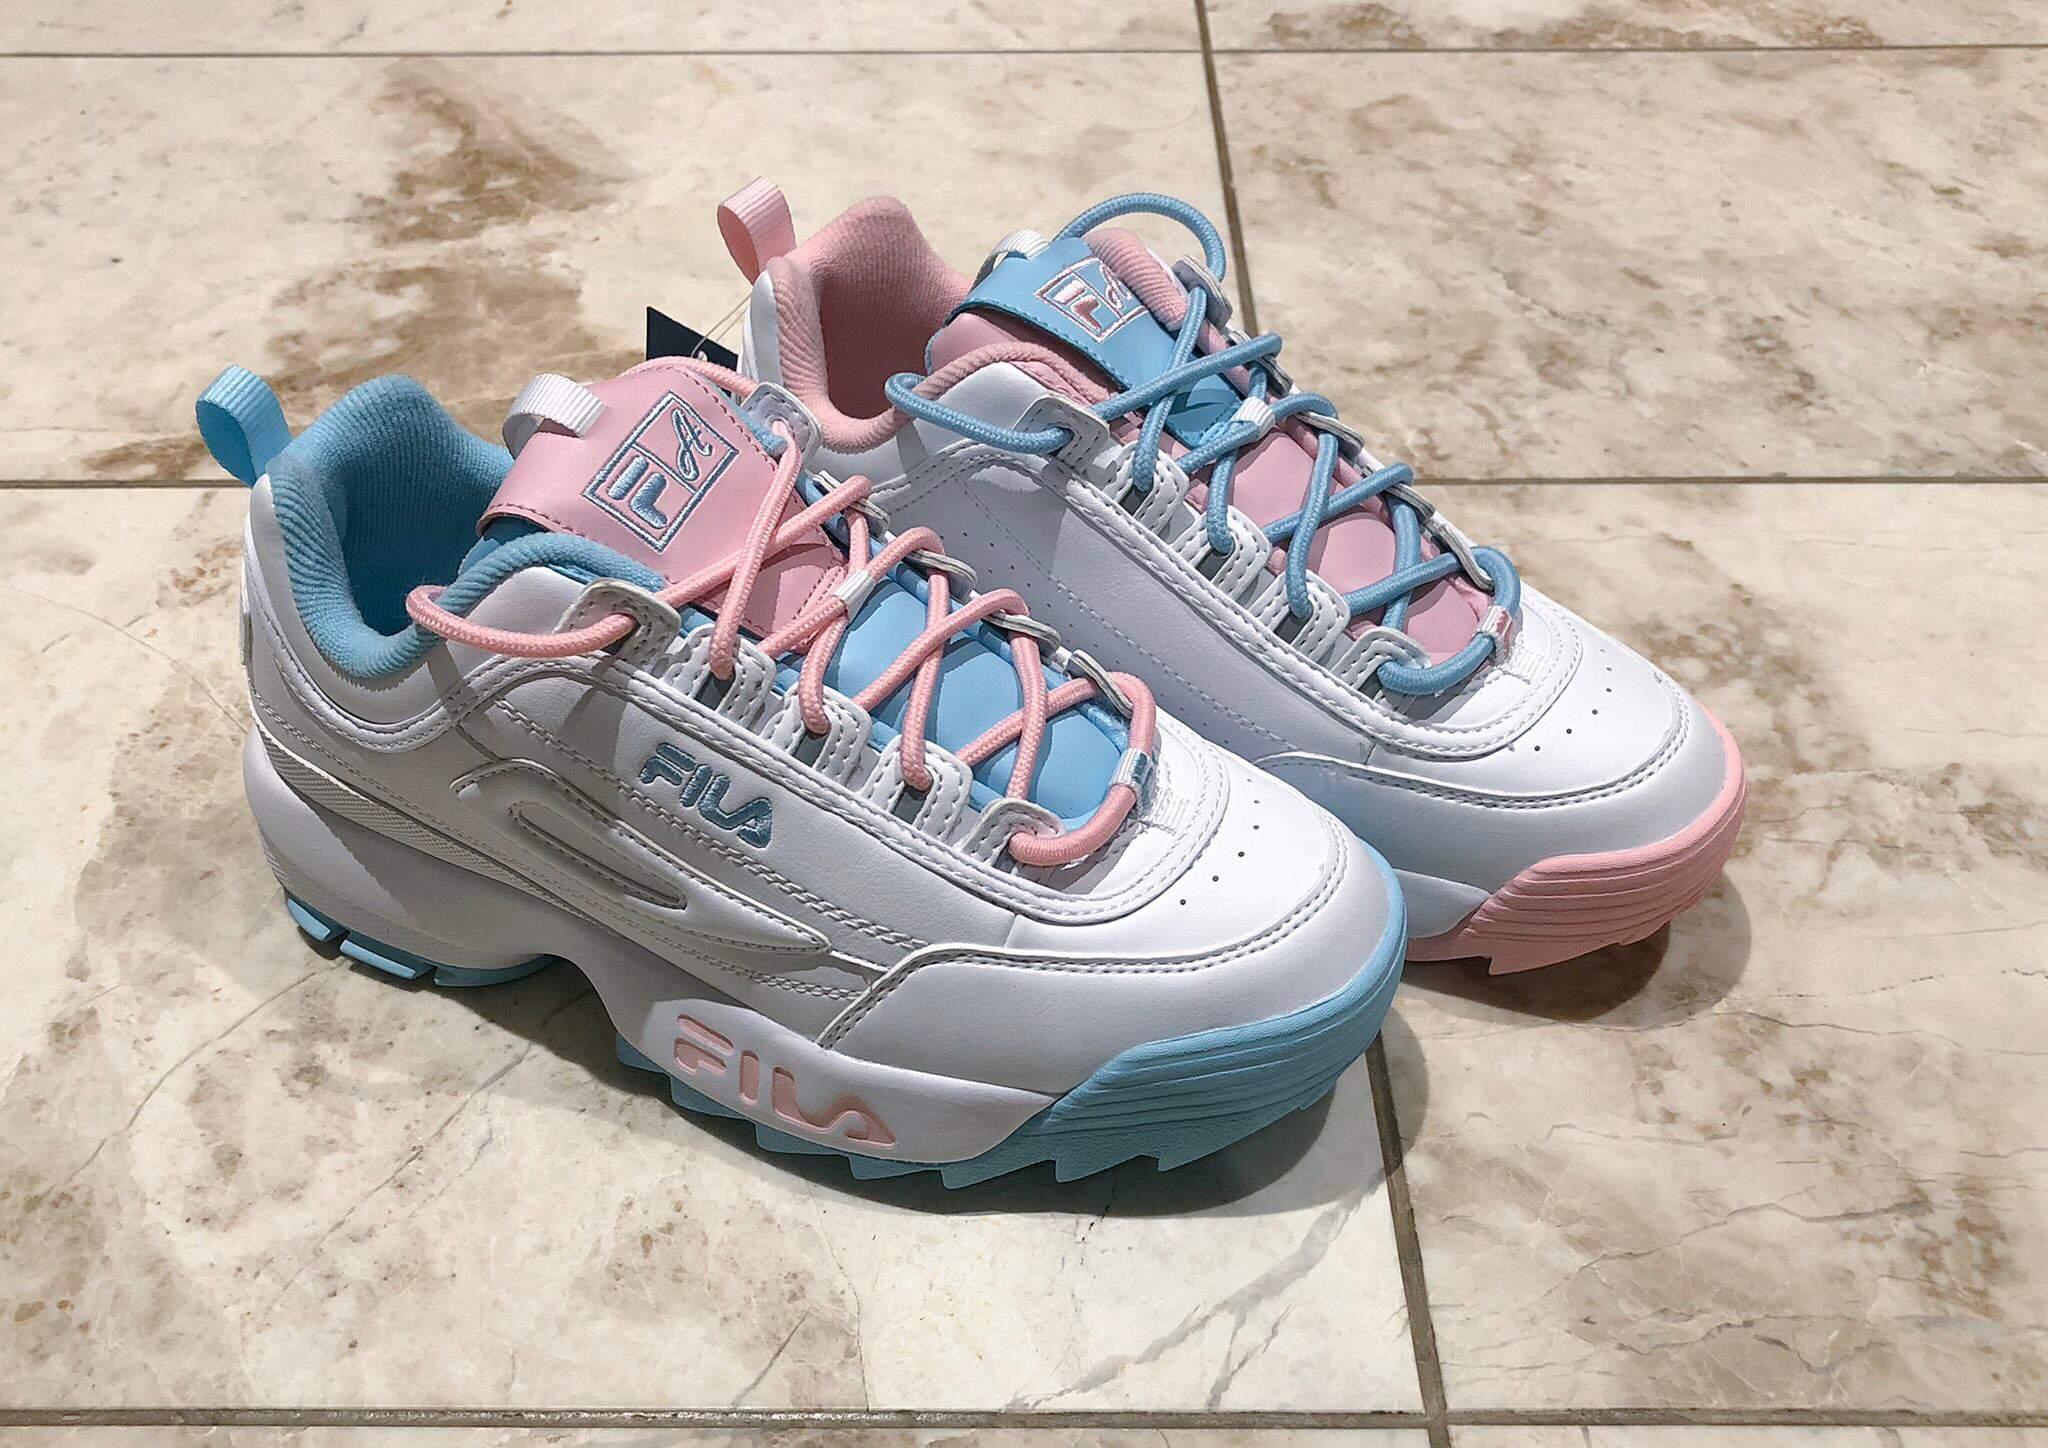 aliexpress special section exquisite design ATIPICI X FILA Shoe Unboxing (AKA carat shoes) | Seventeen ...